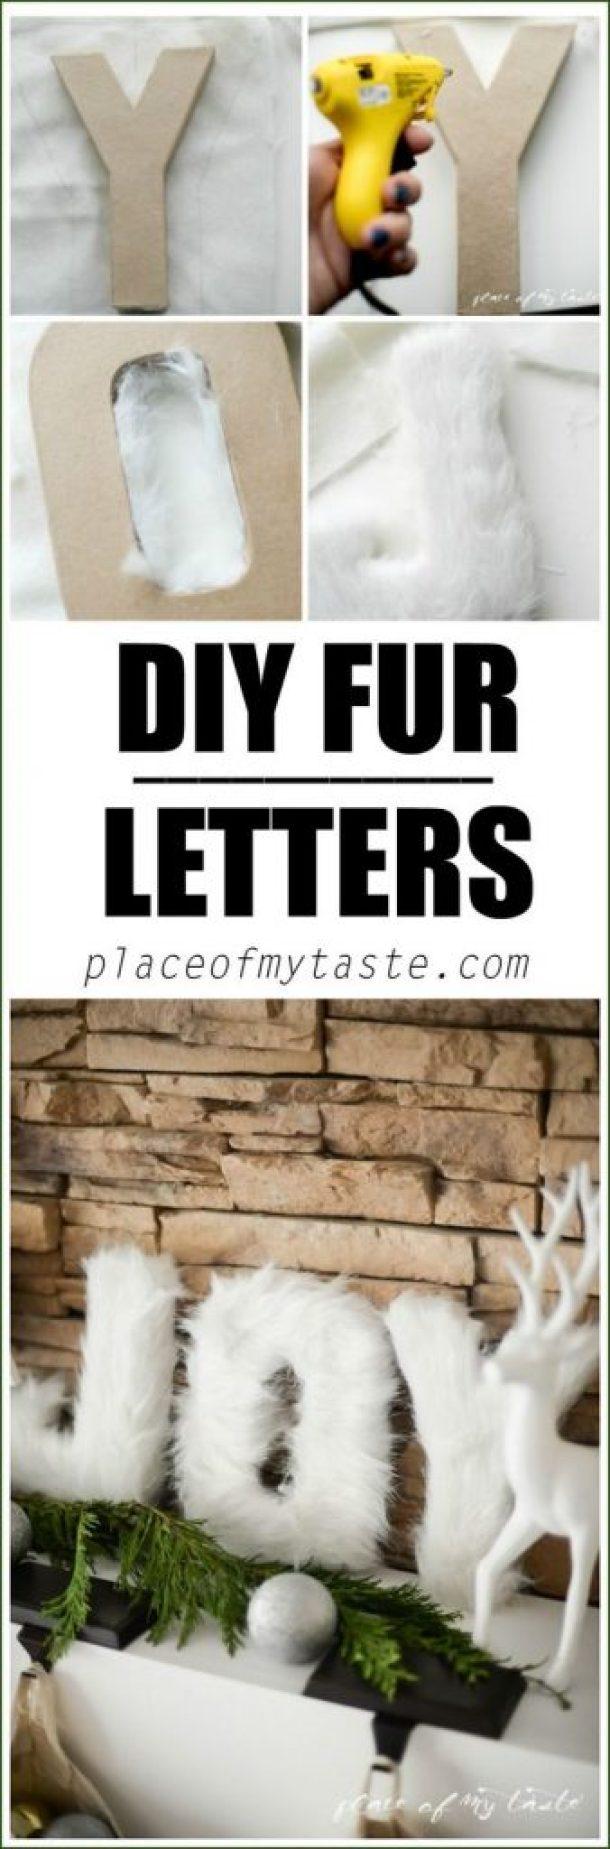 DIY Fur Letters Christmas Mantel Decorations Tutorial | Place of My Taste